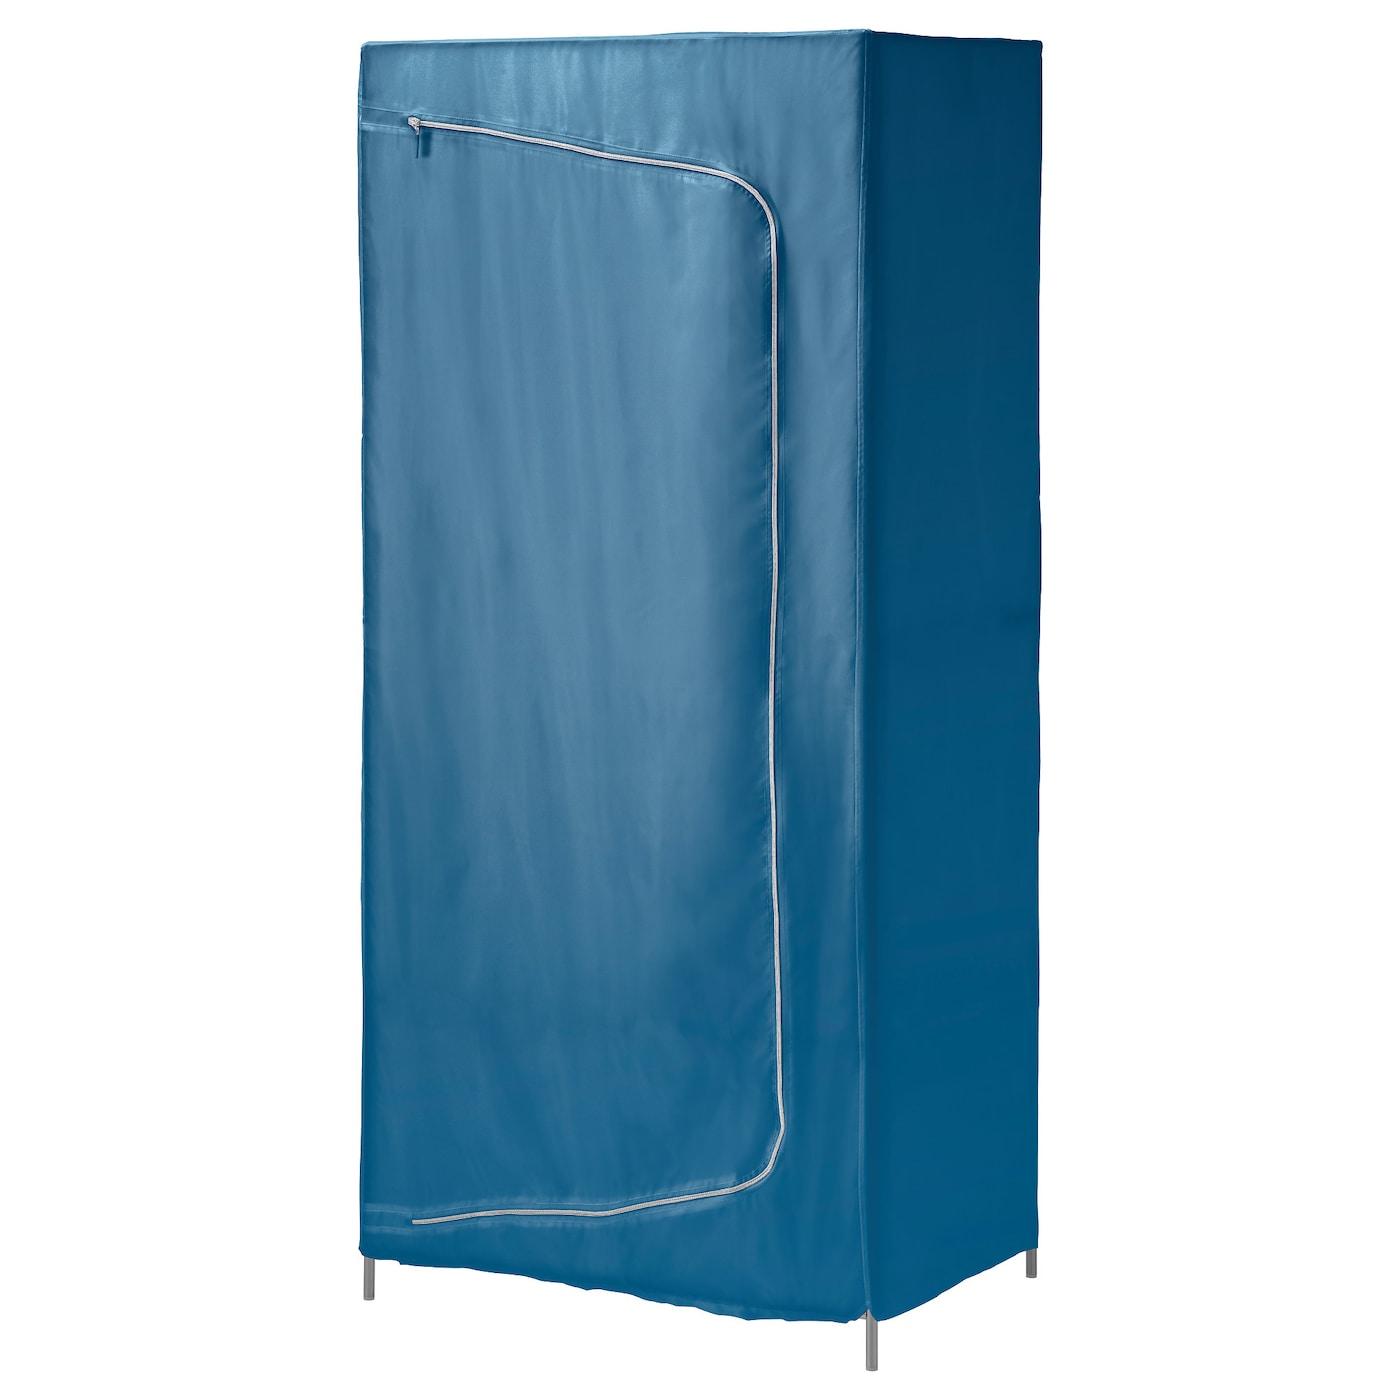 breim armoire penderie bleu 80x55x180 cm ikea. Black Bedroom Furniture Sets. Home Design Ideas